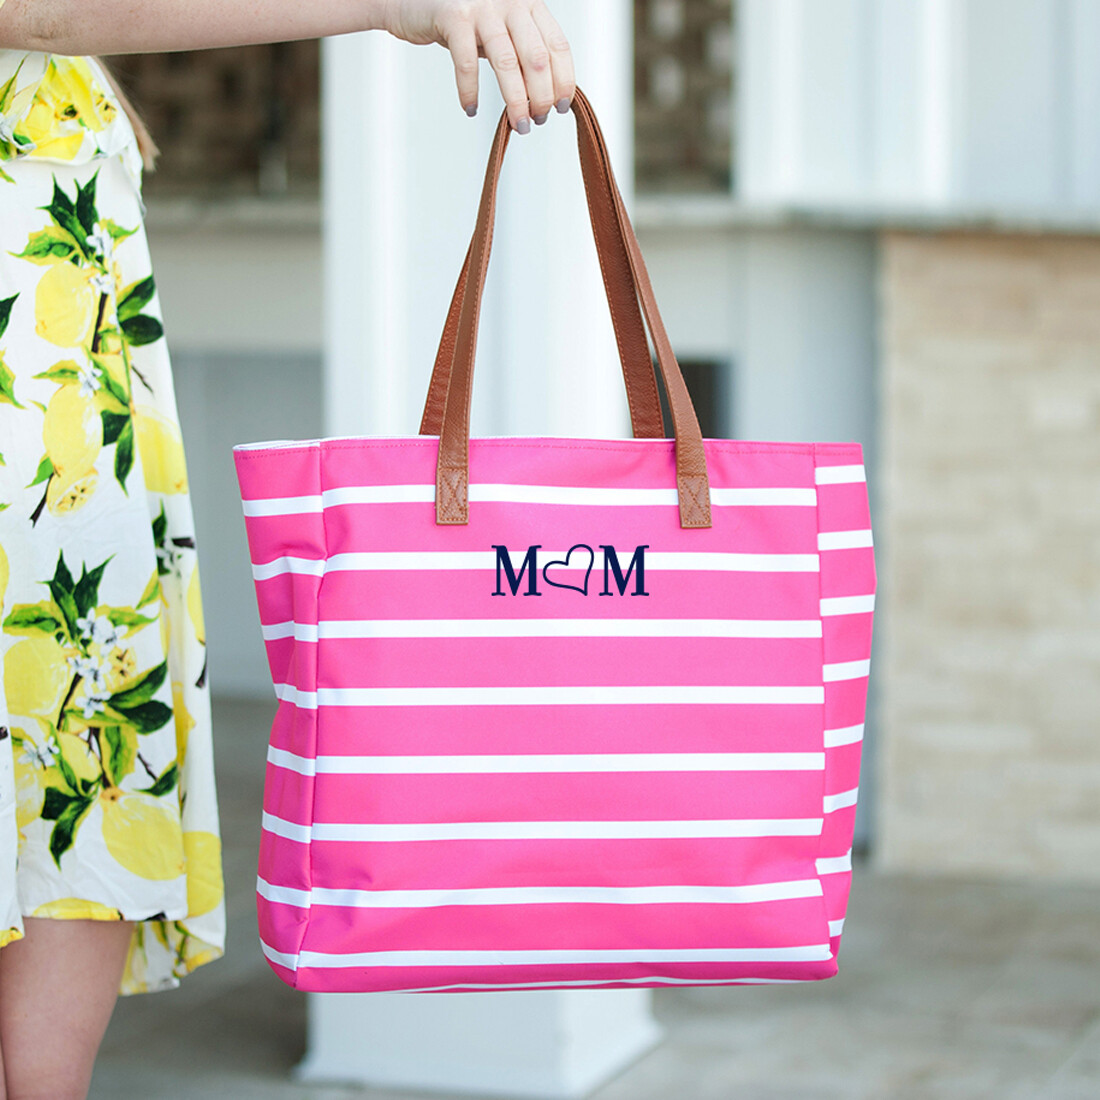 Mom Hot Pink Stripe Tote Bag